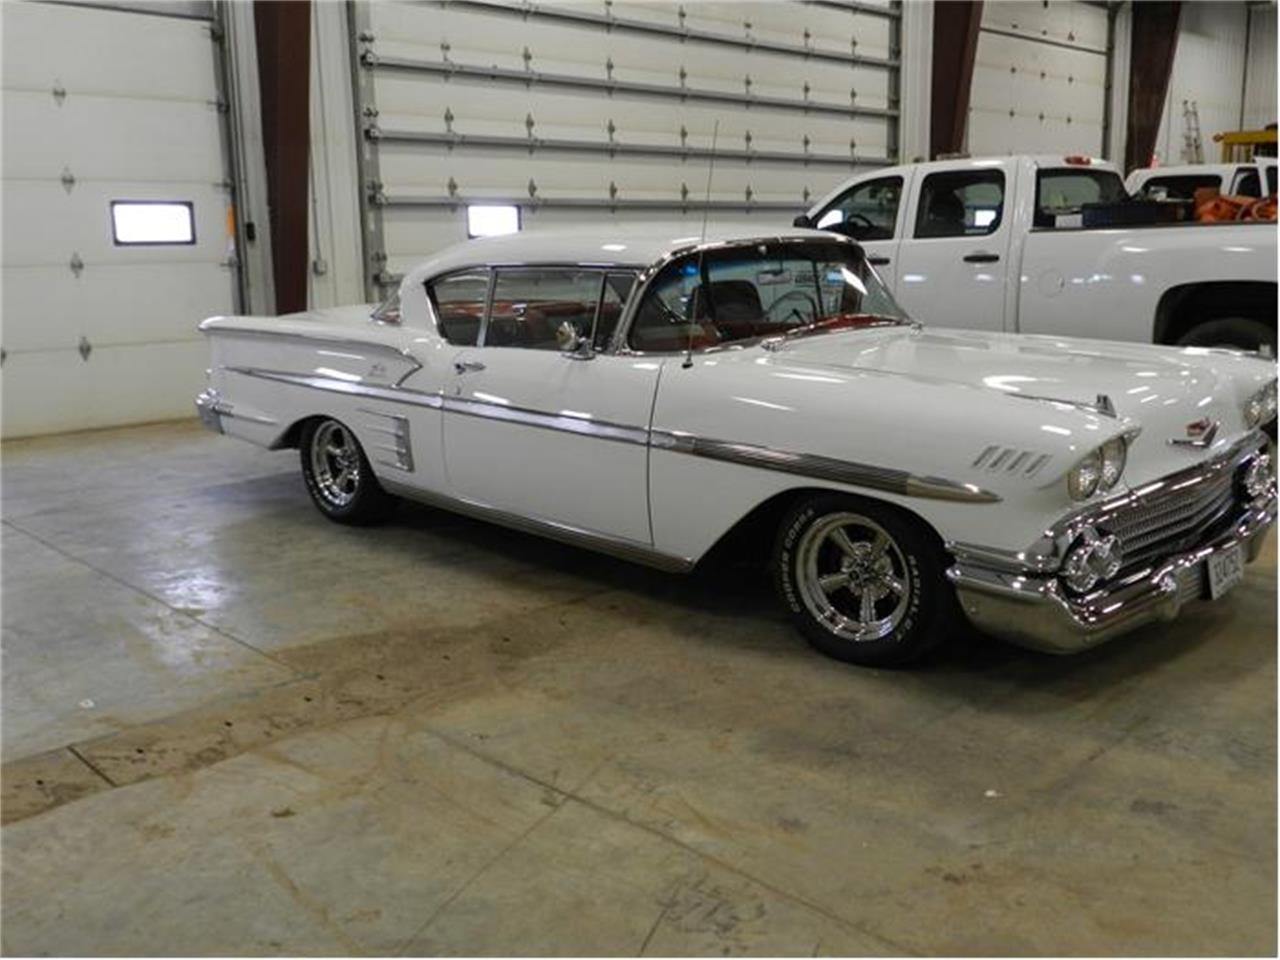 1958 chevrolet impala for sale cc 419317. Black Bedroom Furniture Sets. Home Design Ideas